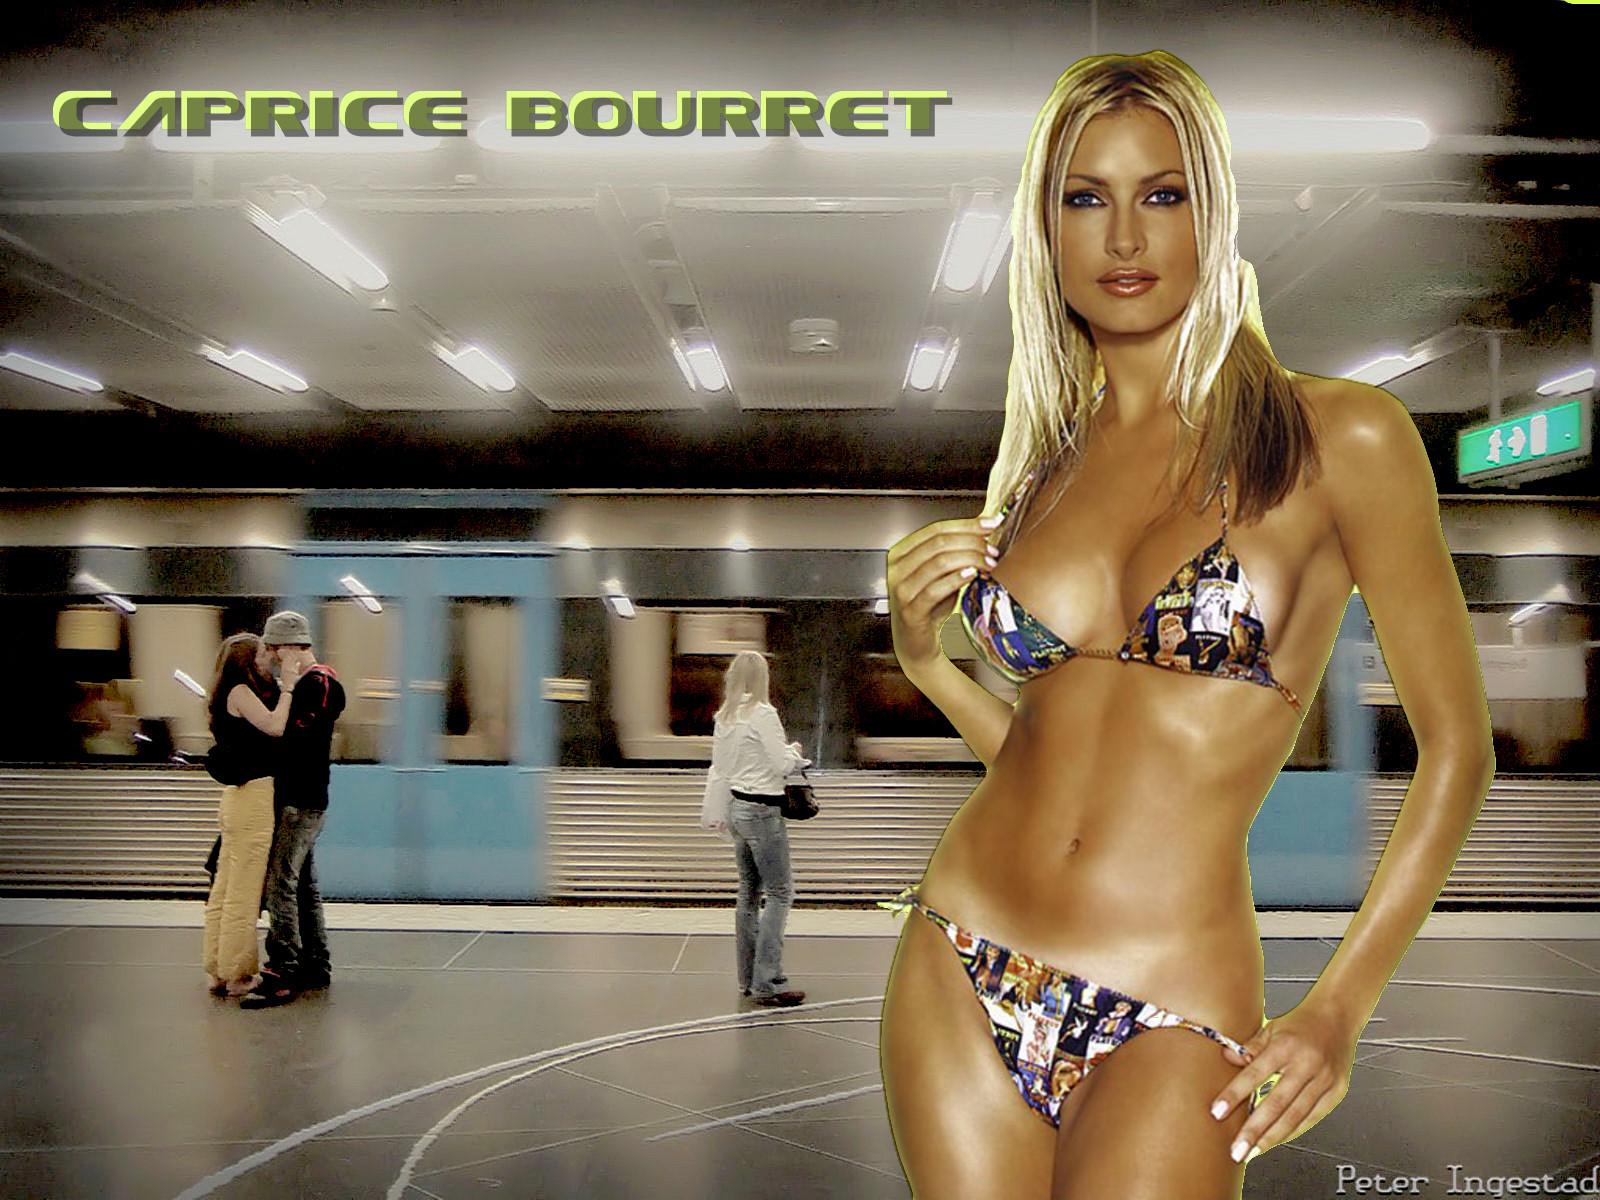 http://fxpaper.fatalsystem.com/images/wallpapers/celebs/caprice-bourret/caprice_bourret_37.jpg